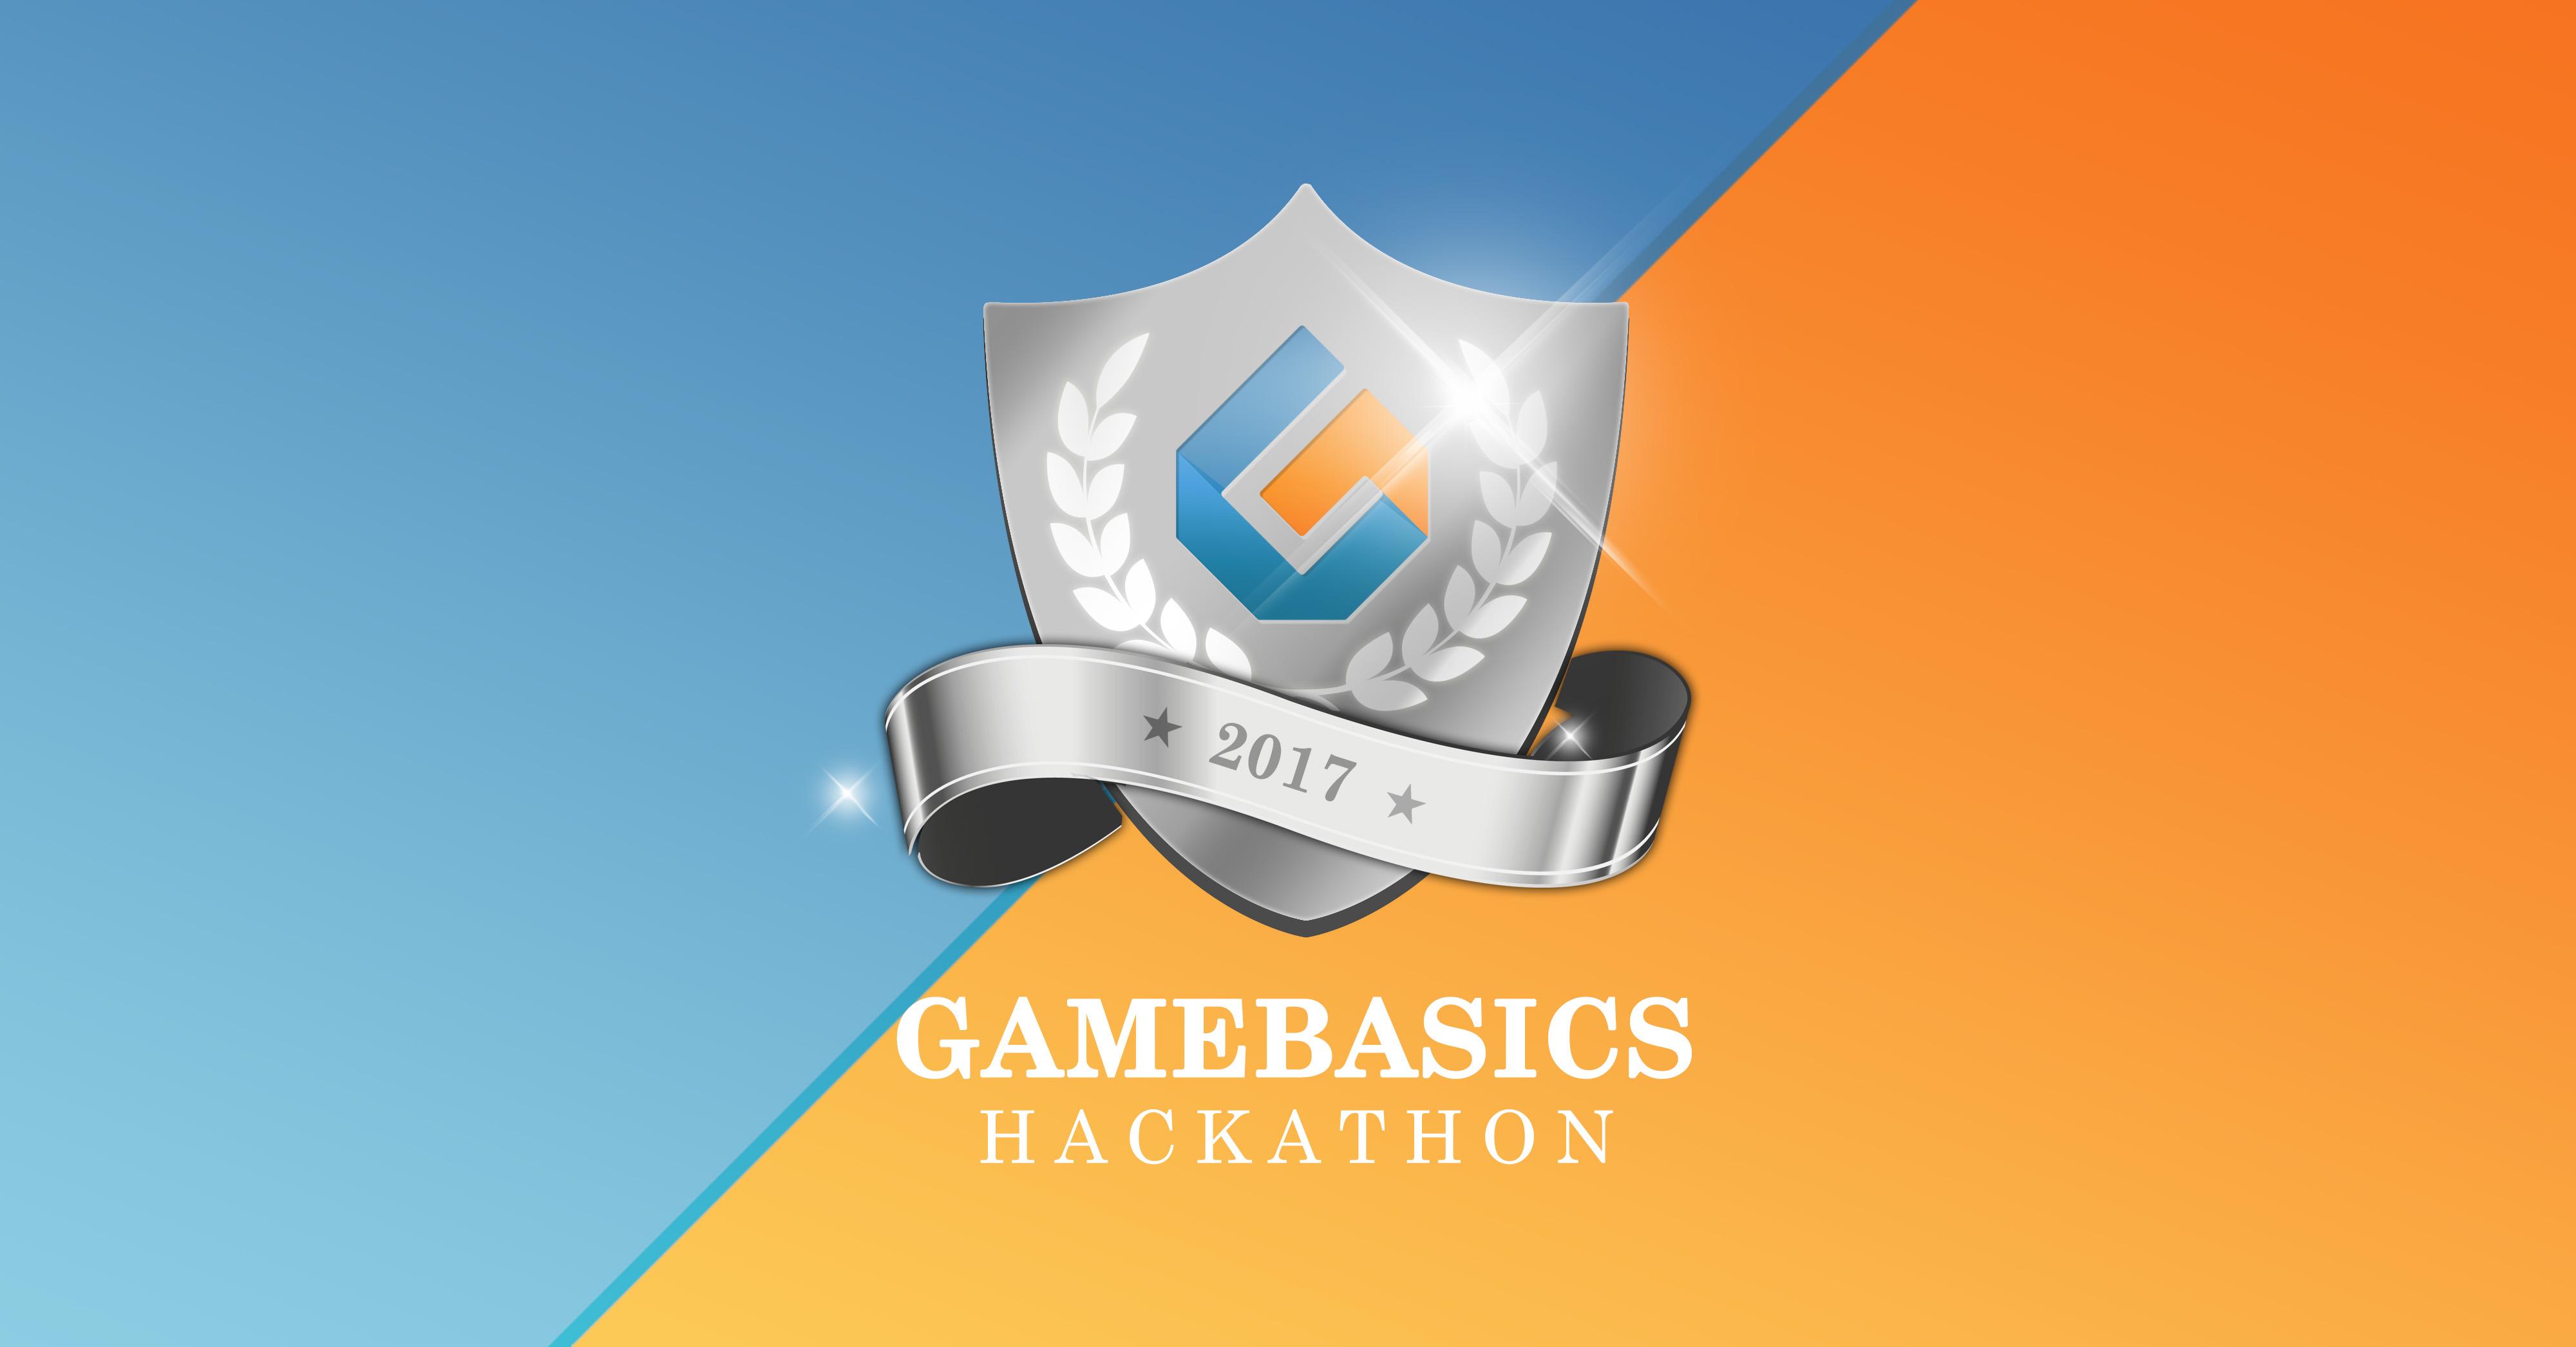 Gamebasics Hackathon 2.0